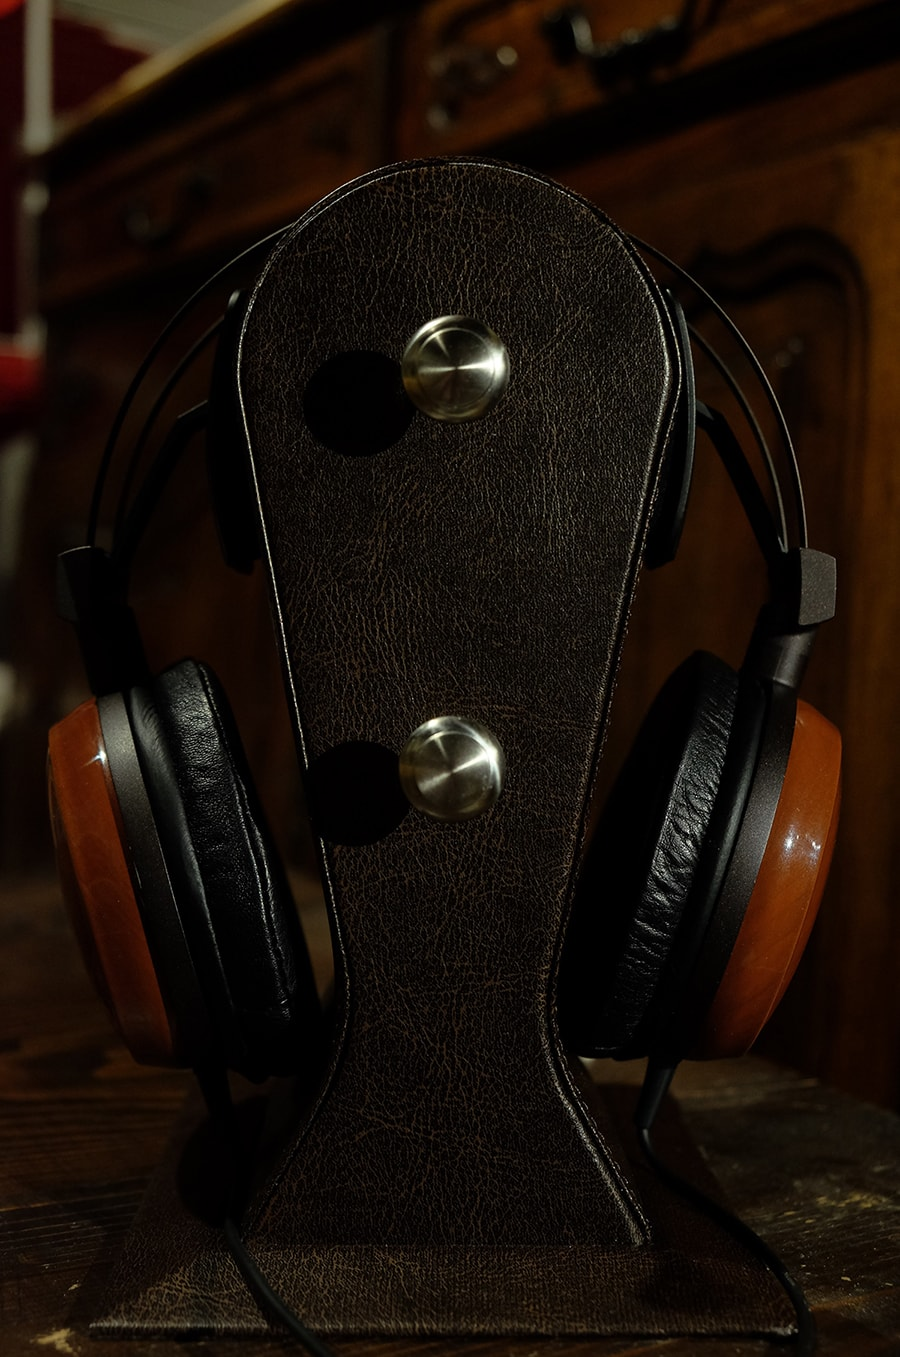 Review: Audio-Technica ATH-W1000X